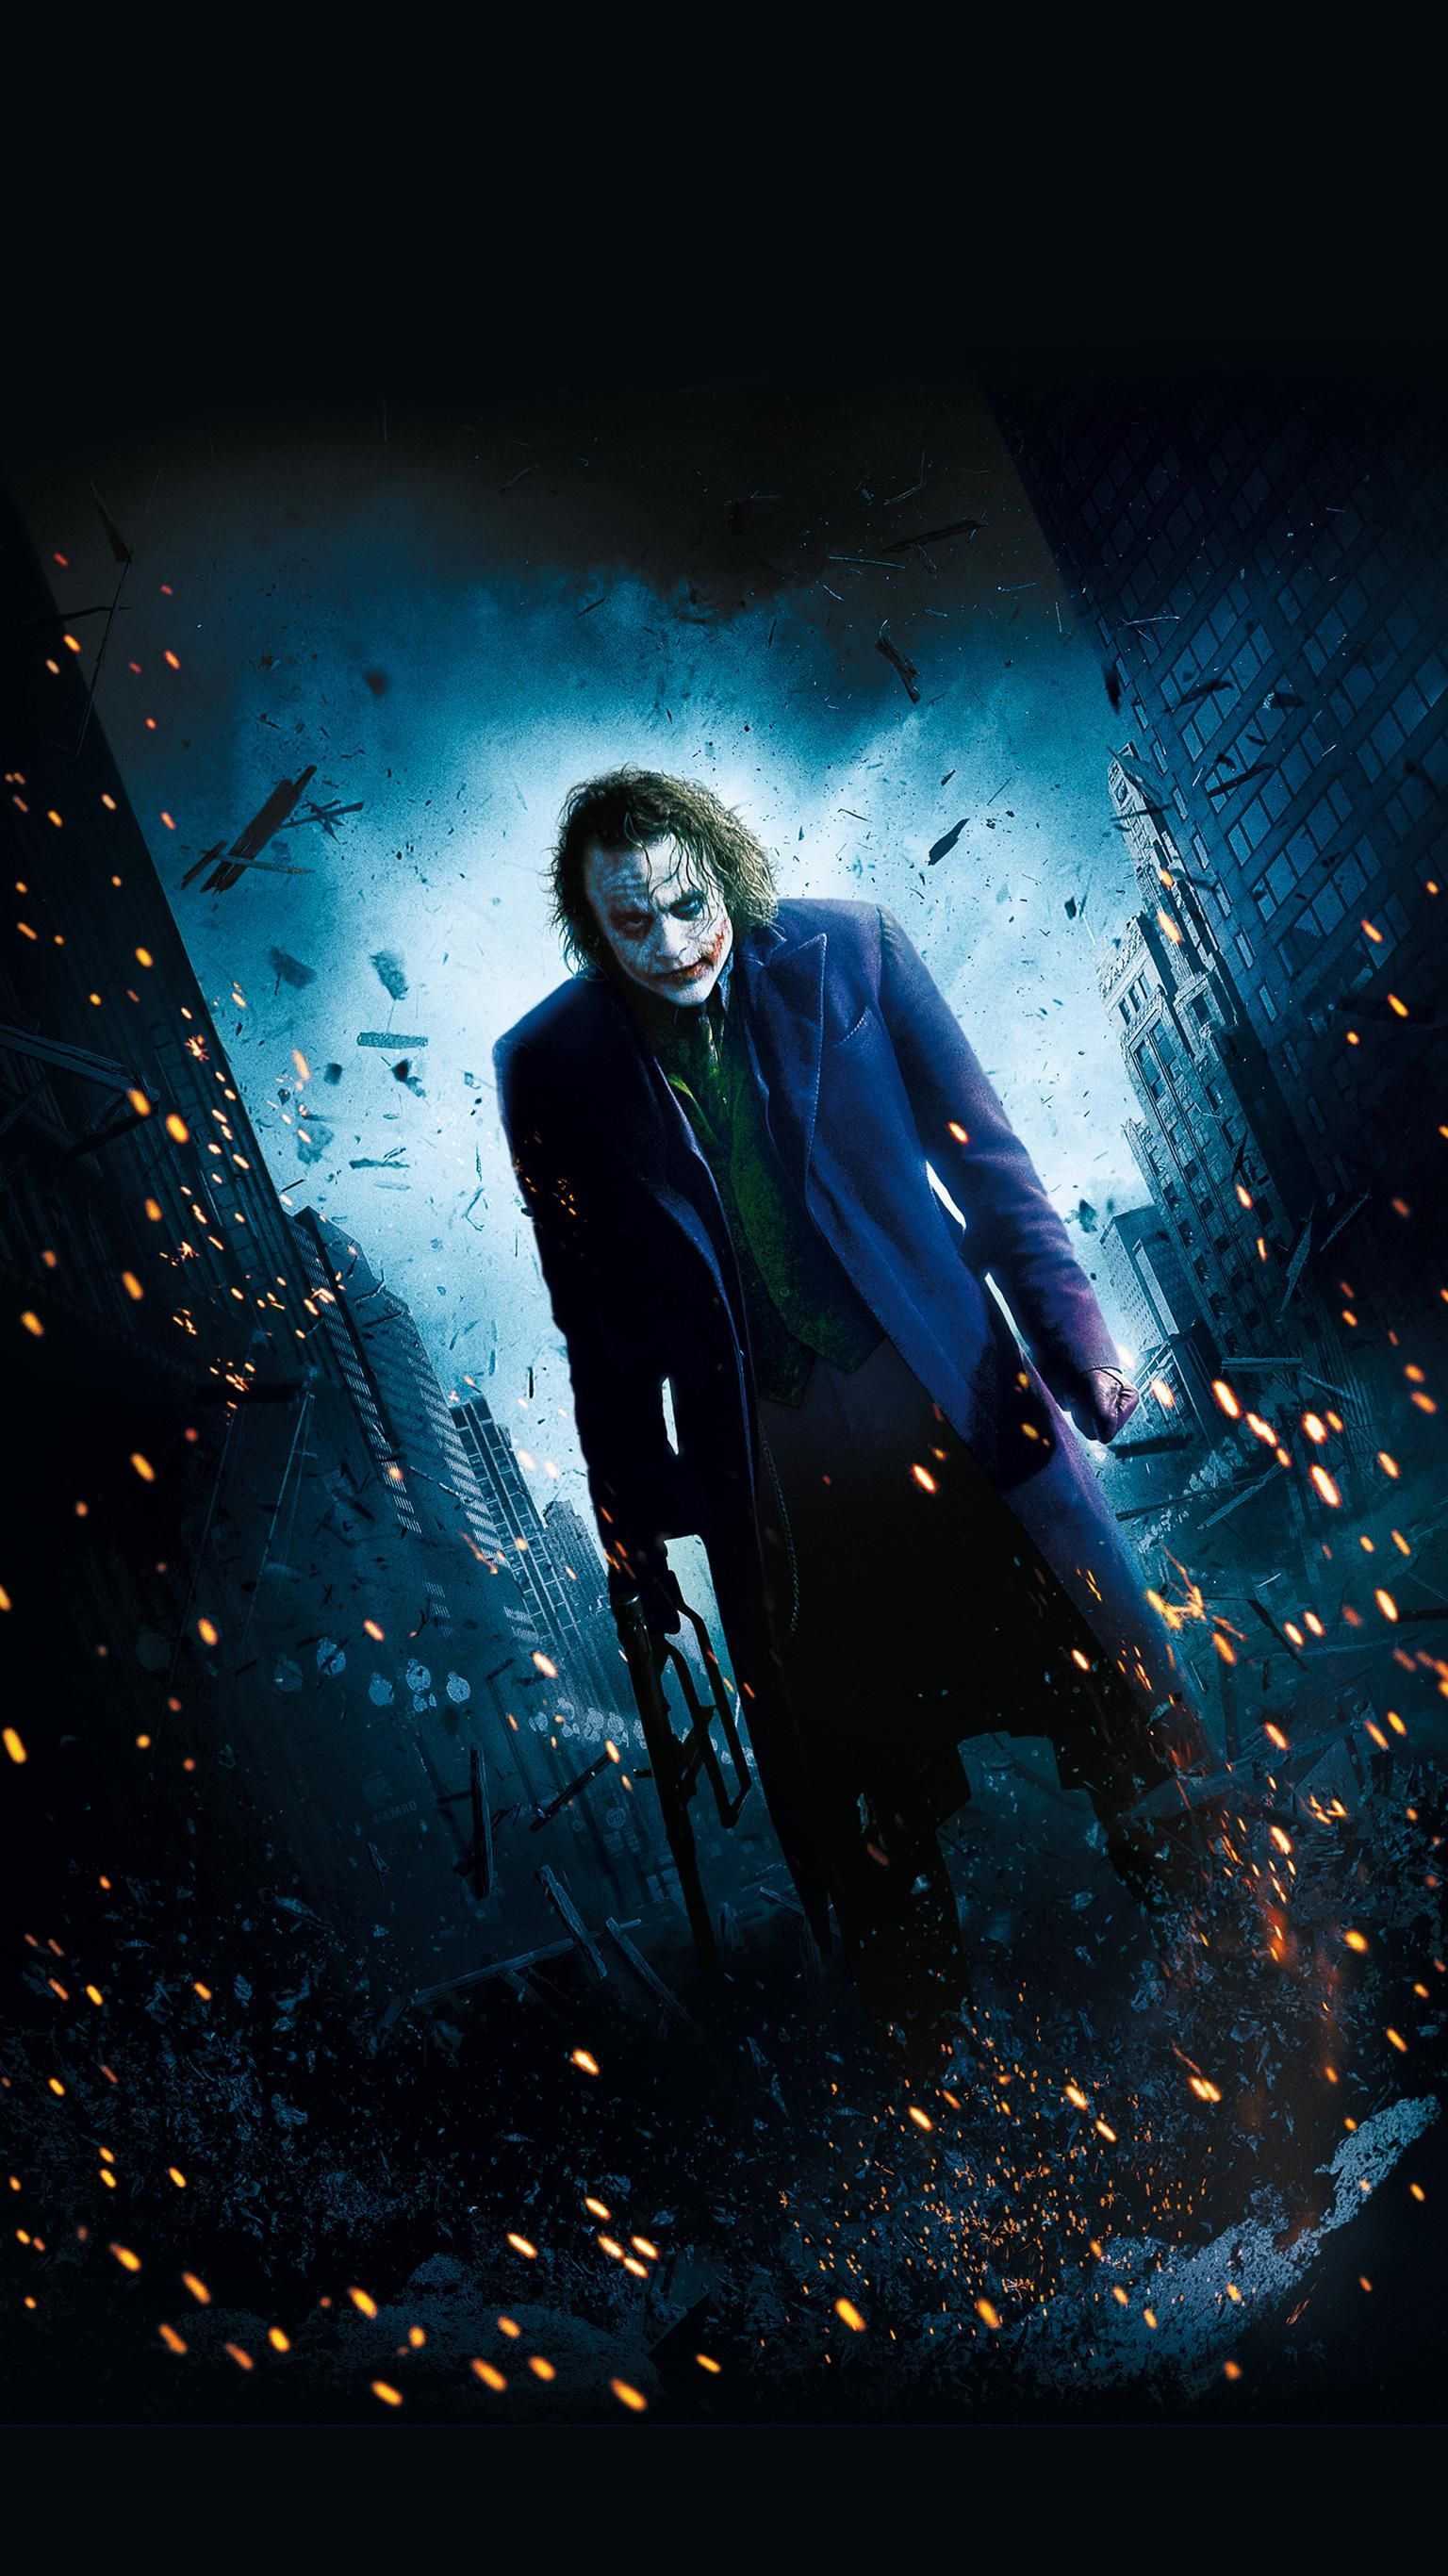 The Dark Knight (2008) Phone Wallpaper Joker images